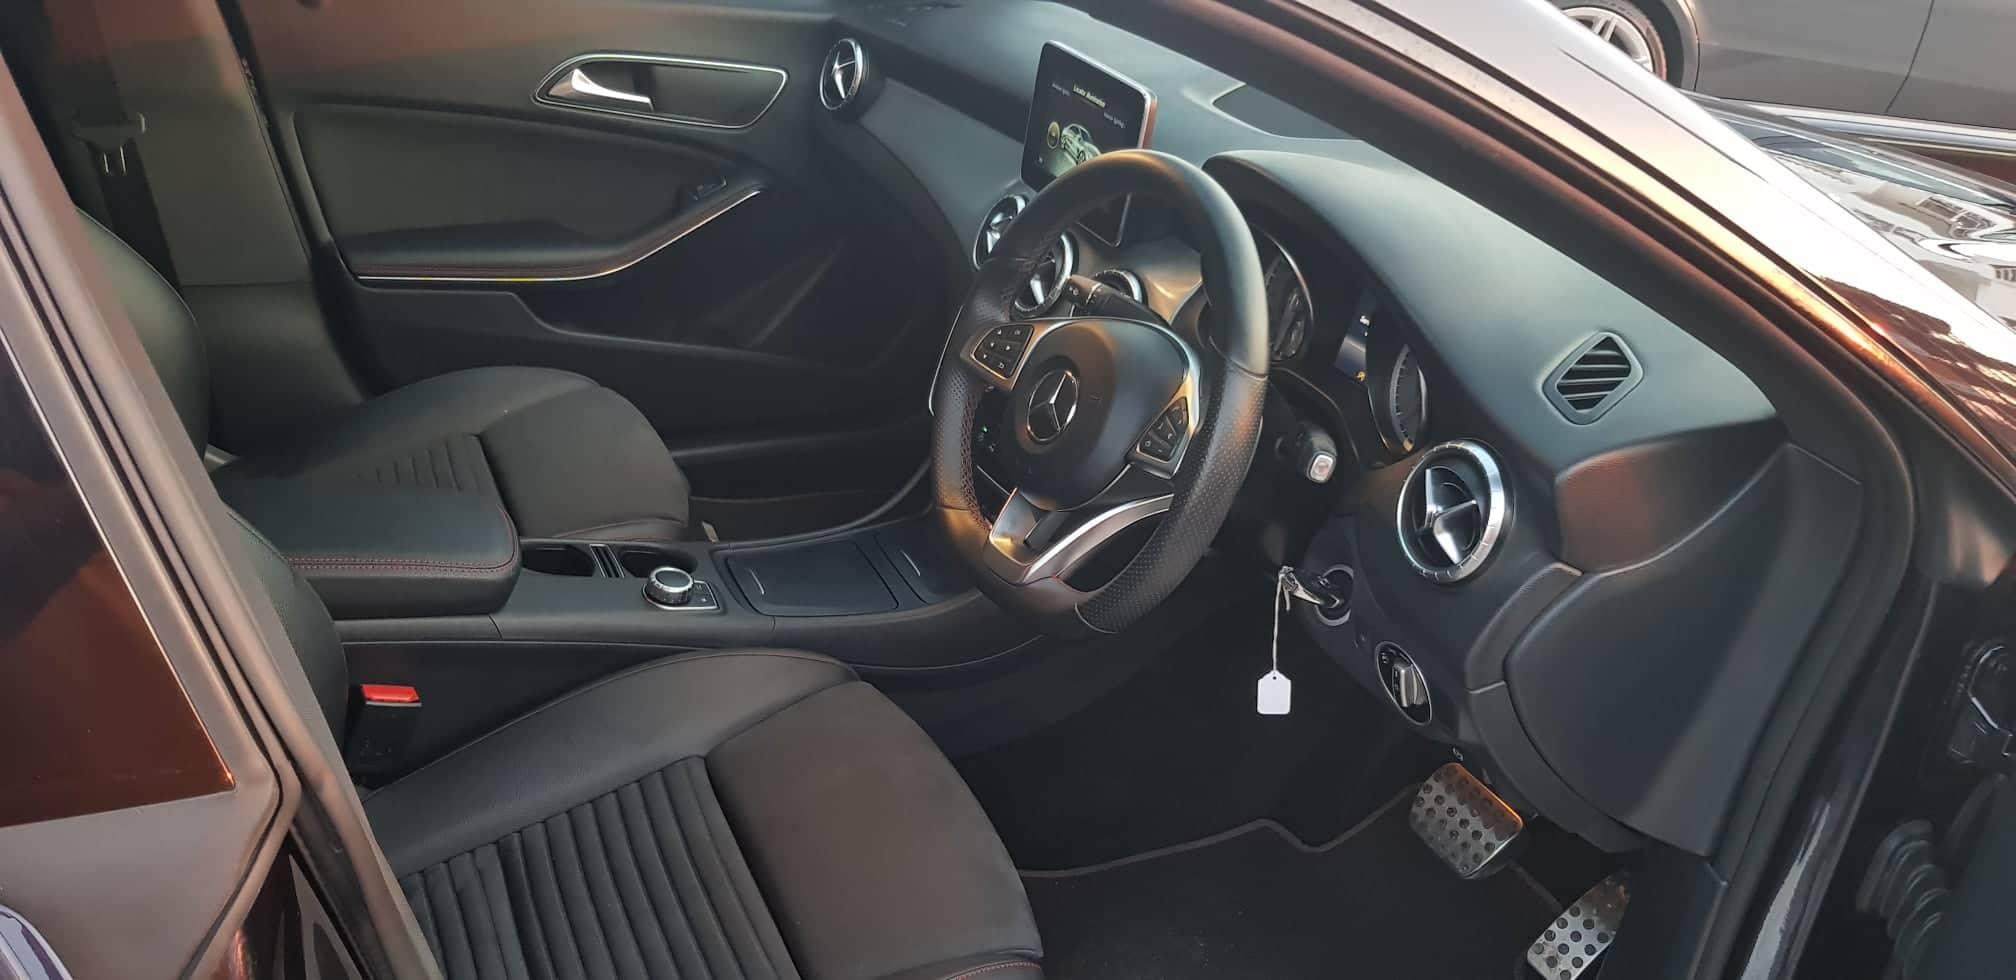 Mercedes Benz CLA 220D AMG